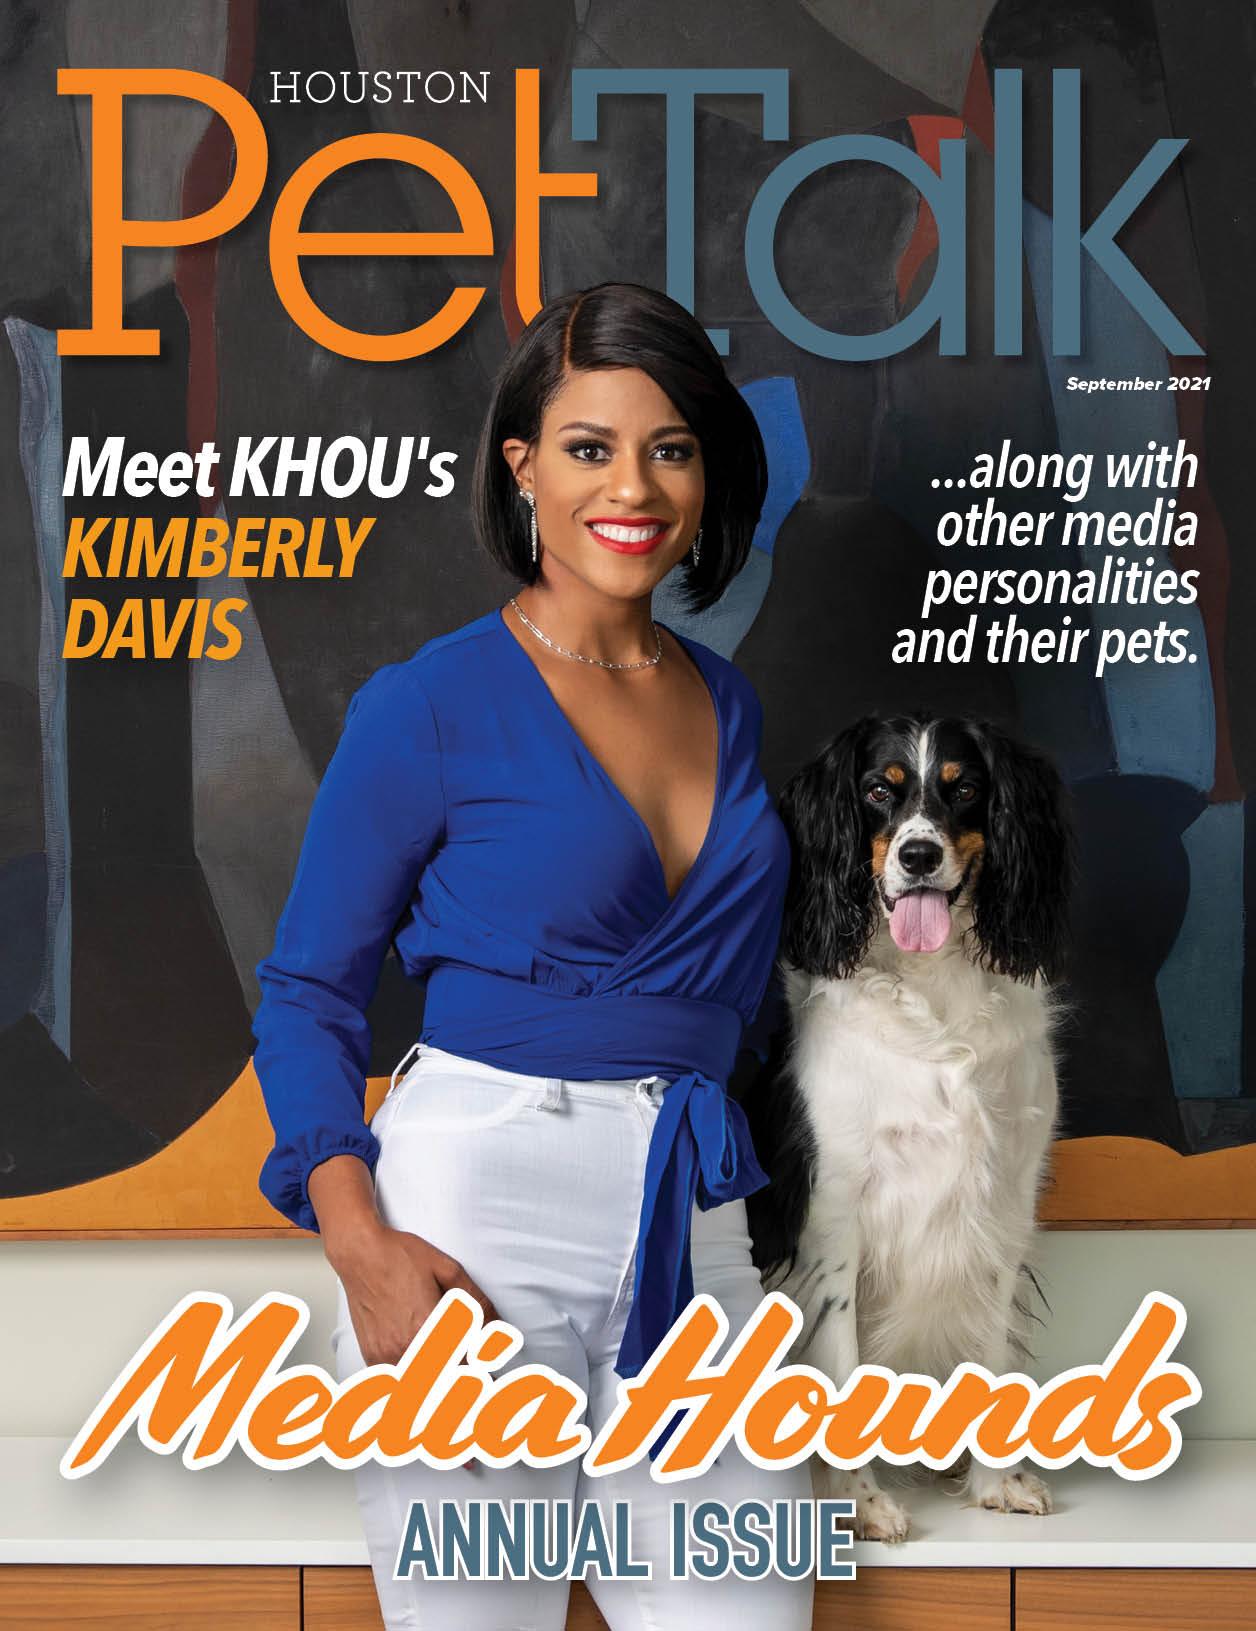 September 2021 Digital Issue of Houston PetTalk